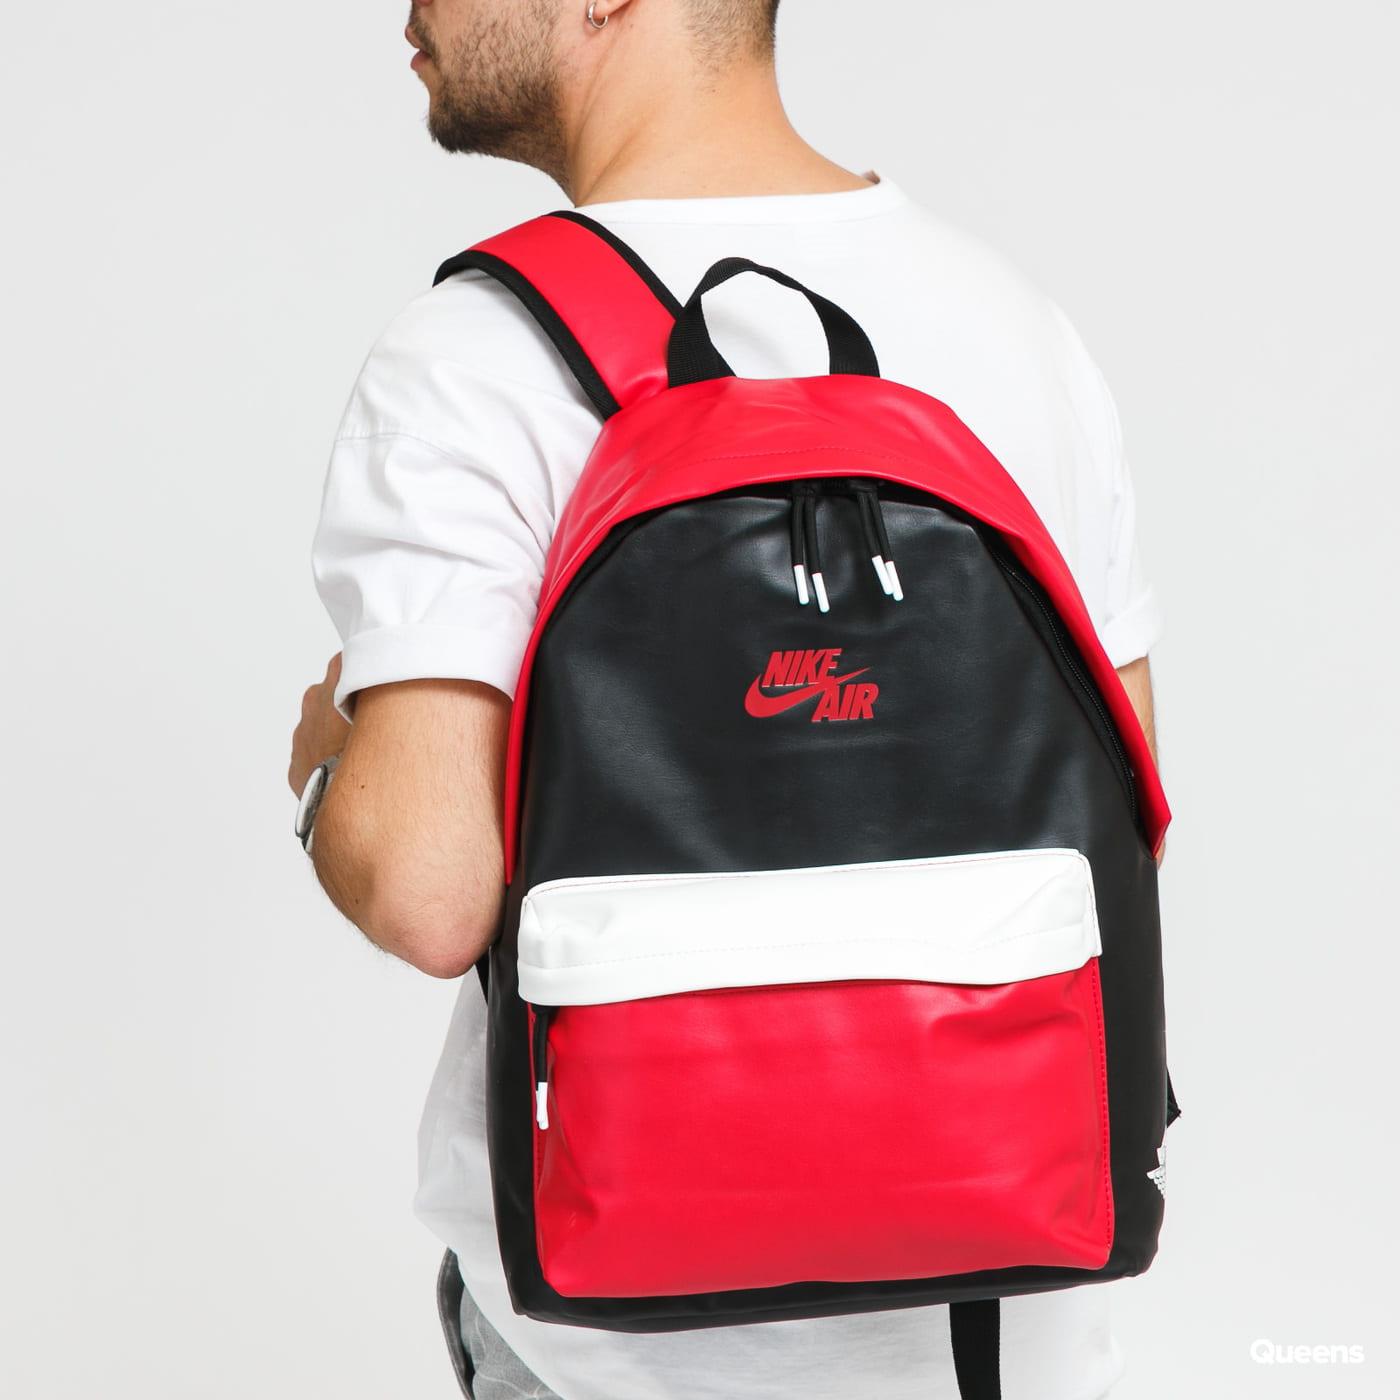 Jordan Air 1 Backpack červený / čierny / biely